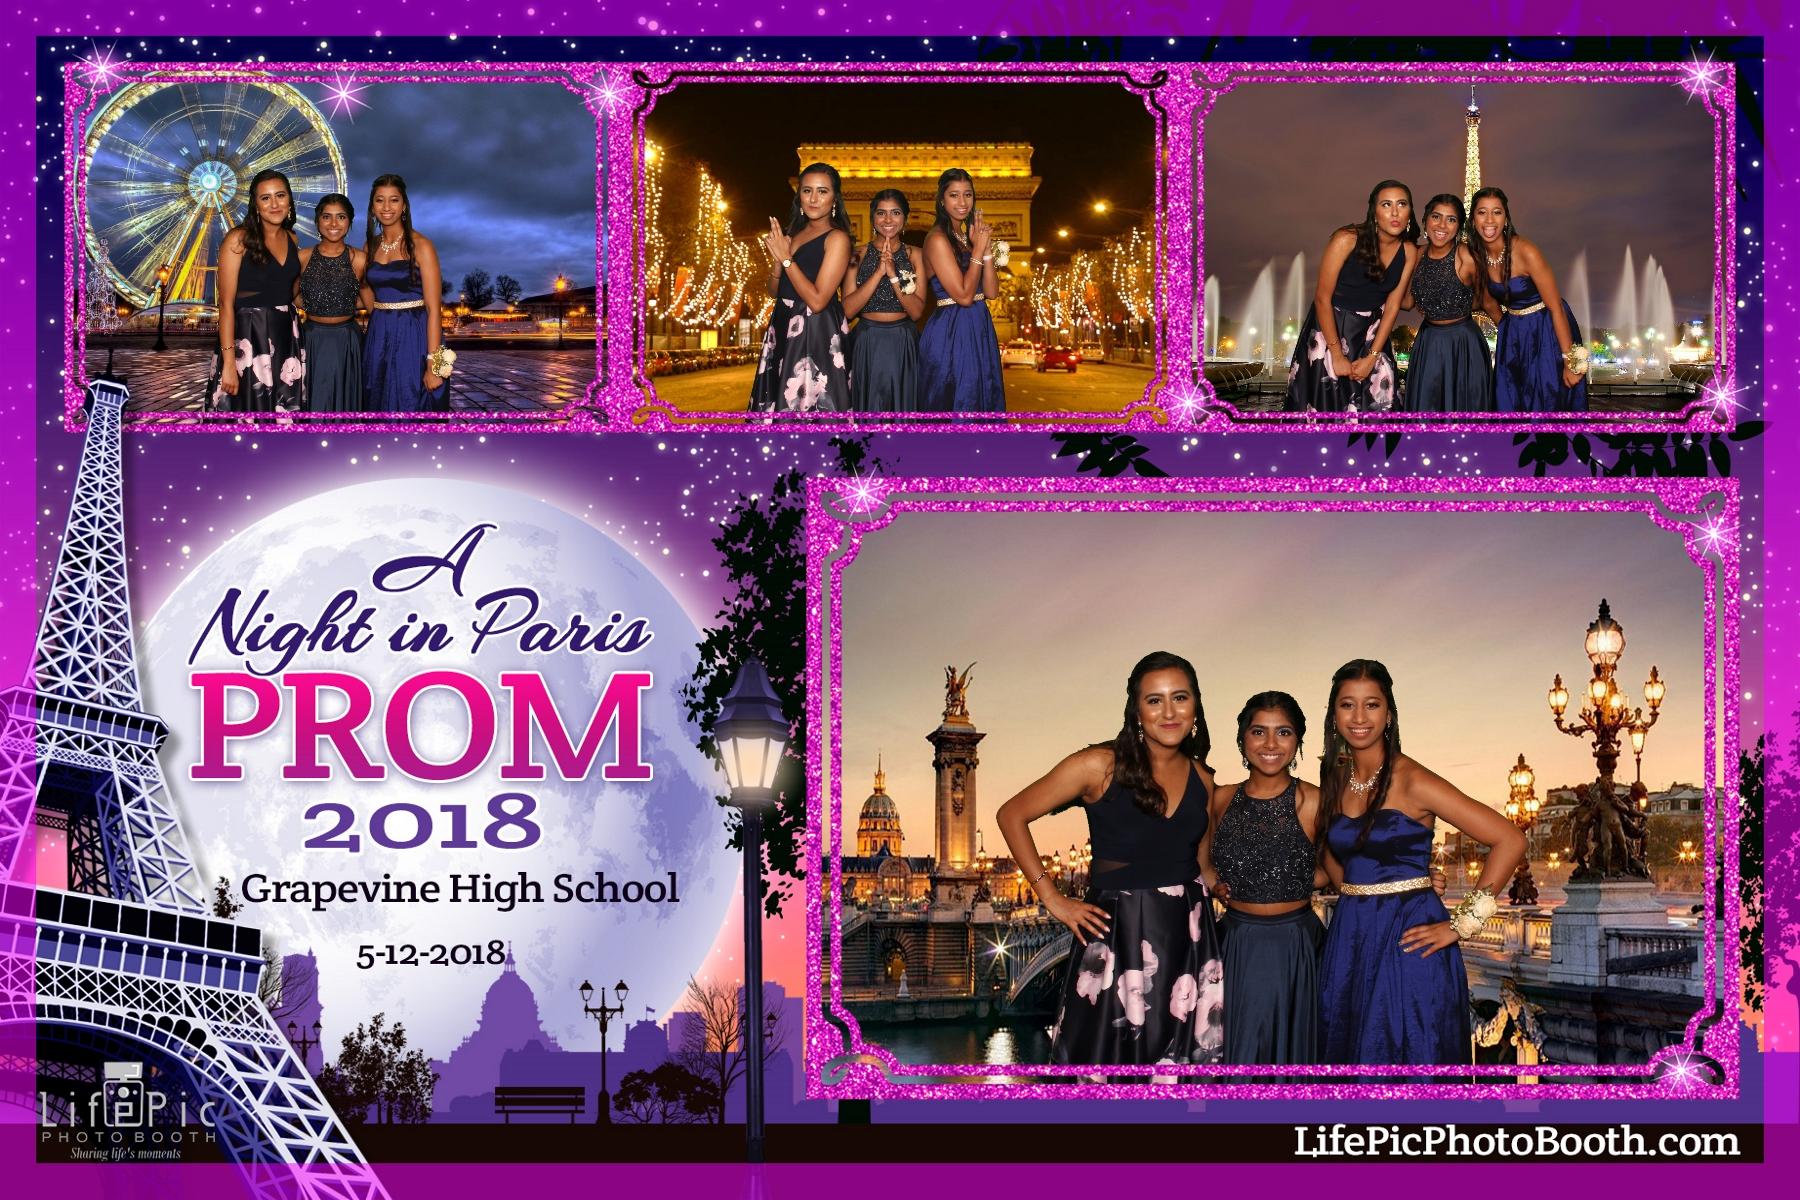 Grapevine High School Prom_2018-05-12_21